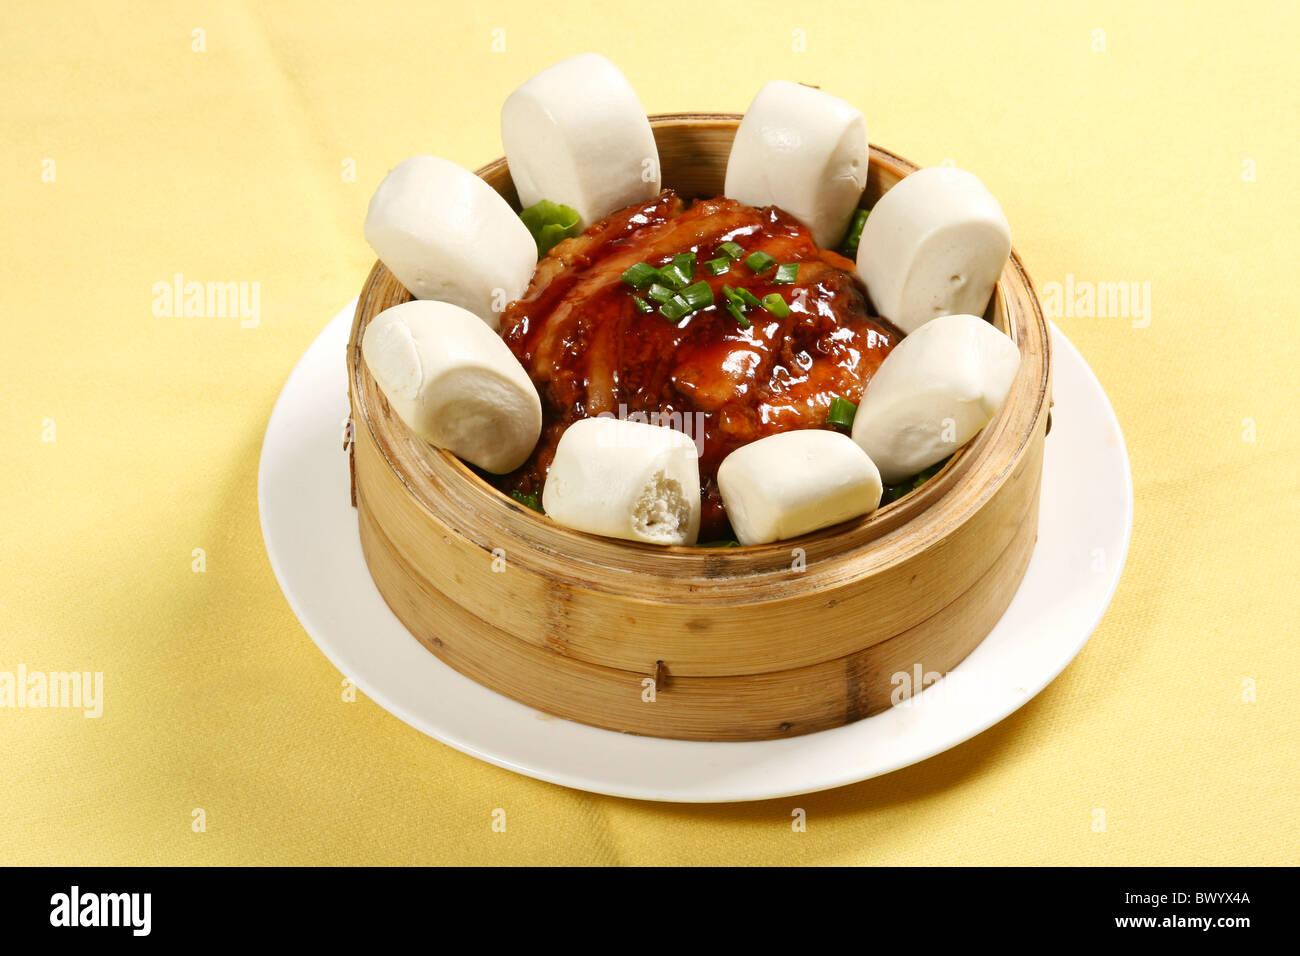 Steamed Pork Bun Stockfotos & Steamed Pork Bun Bilder - Alamy